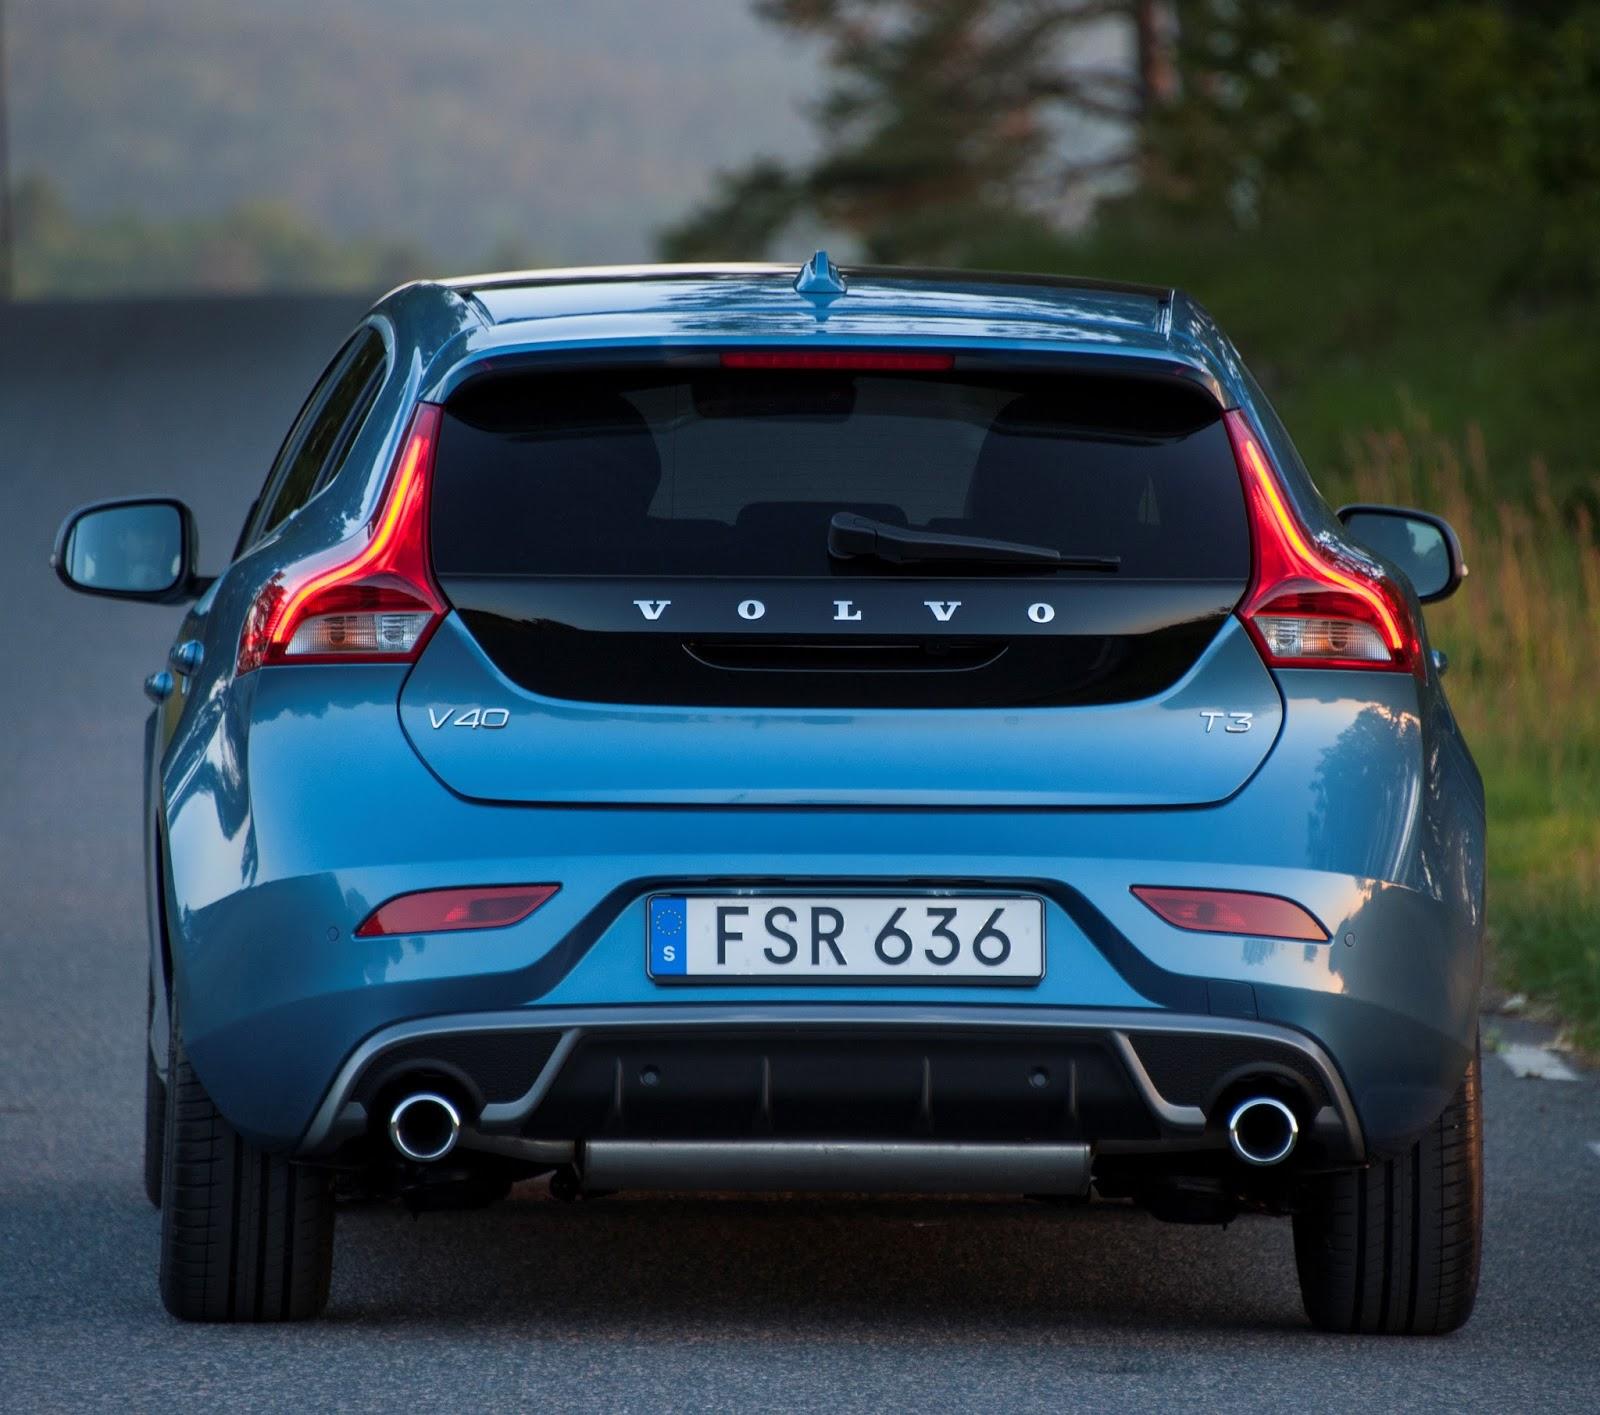 VOLVO%2BV40%2B1.5%2BT3%2BAUTO 3 Το Volvo V40 Cross Country με το νέο κινητήρα 1,5 λίτρων, απόδοσης 152 ίππων από 21.900 €